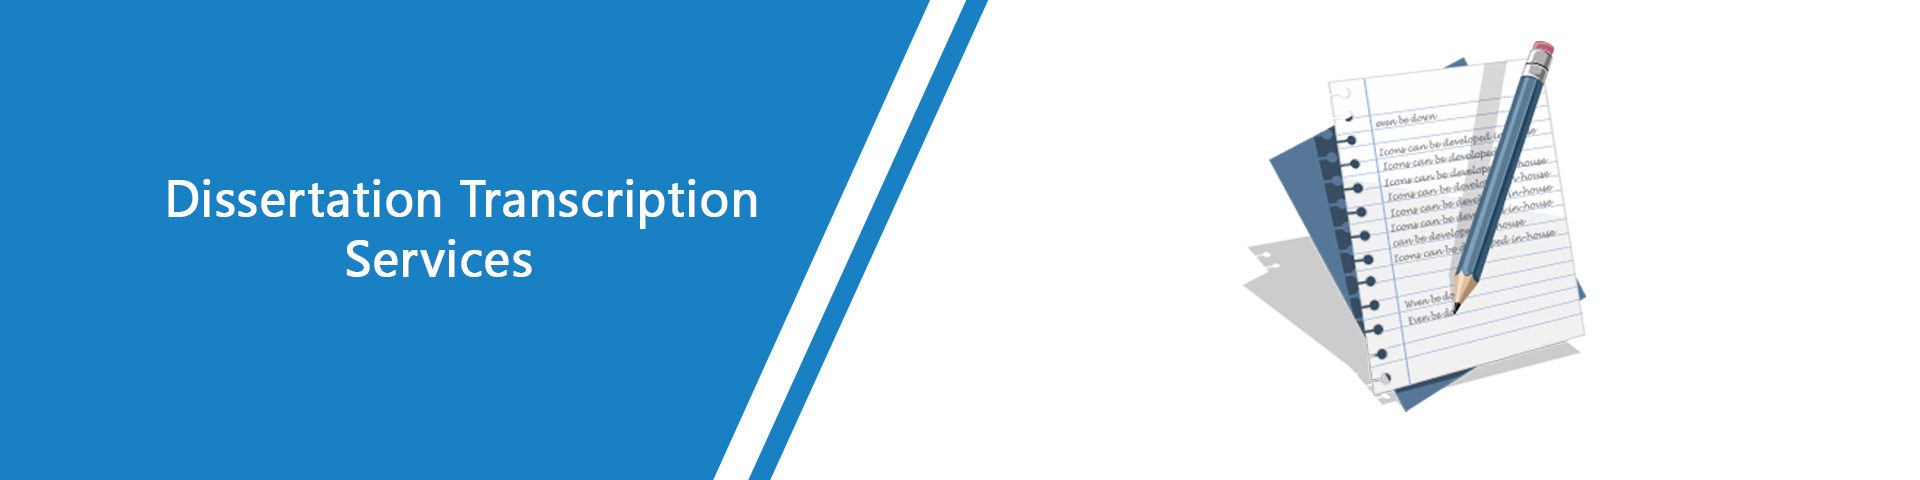 Dissertation Transcription Services